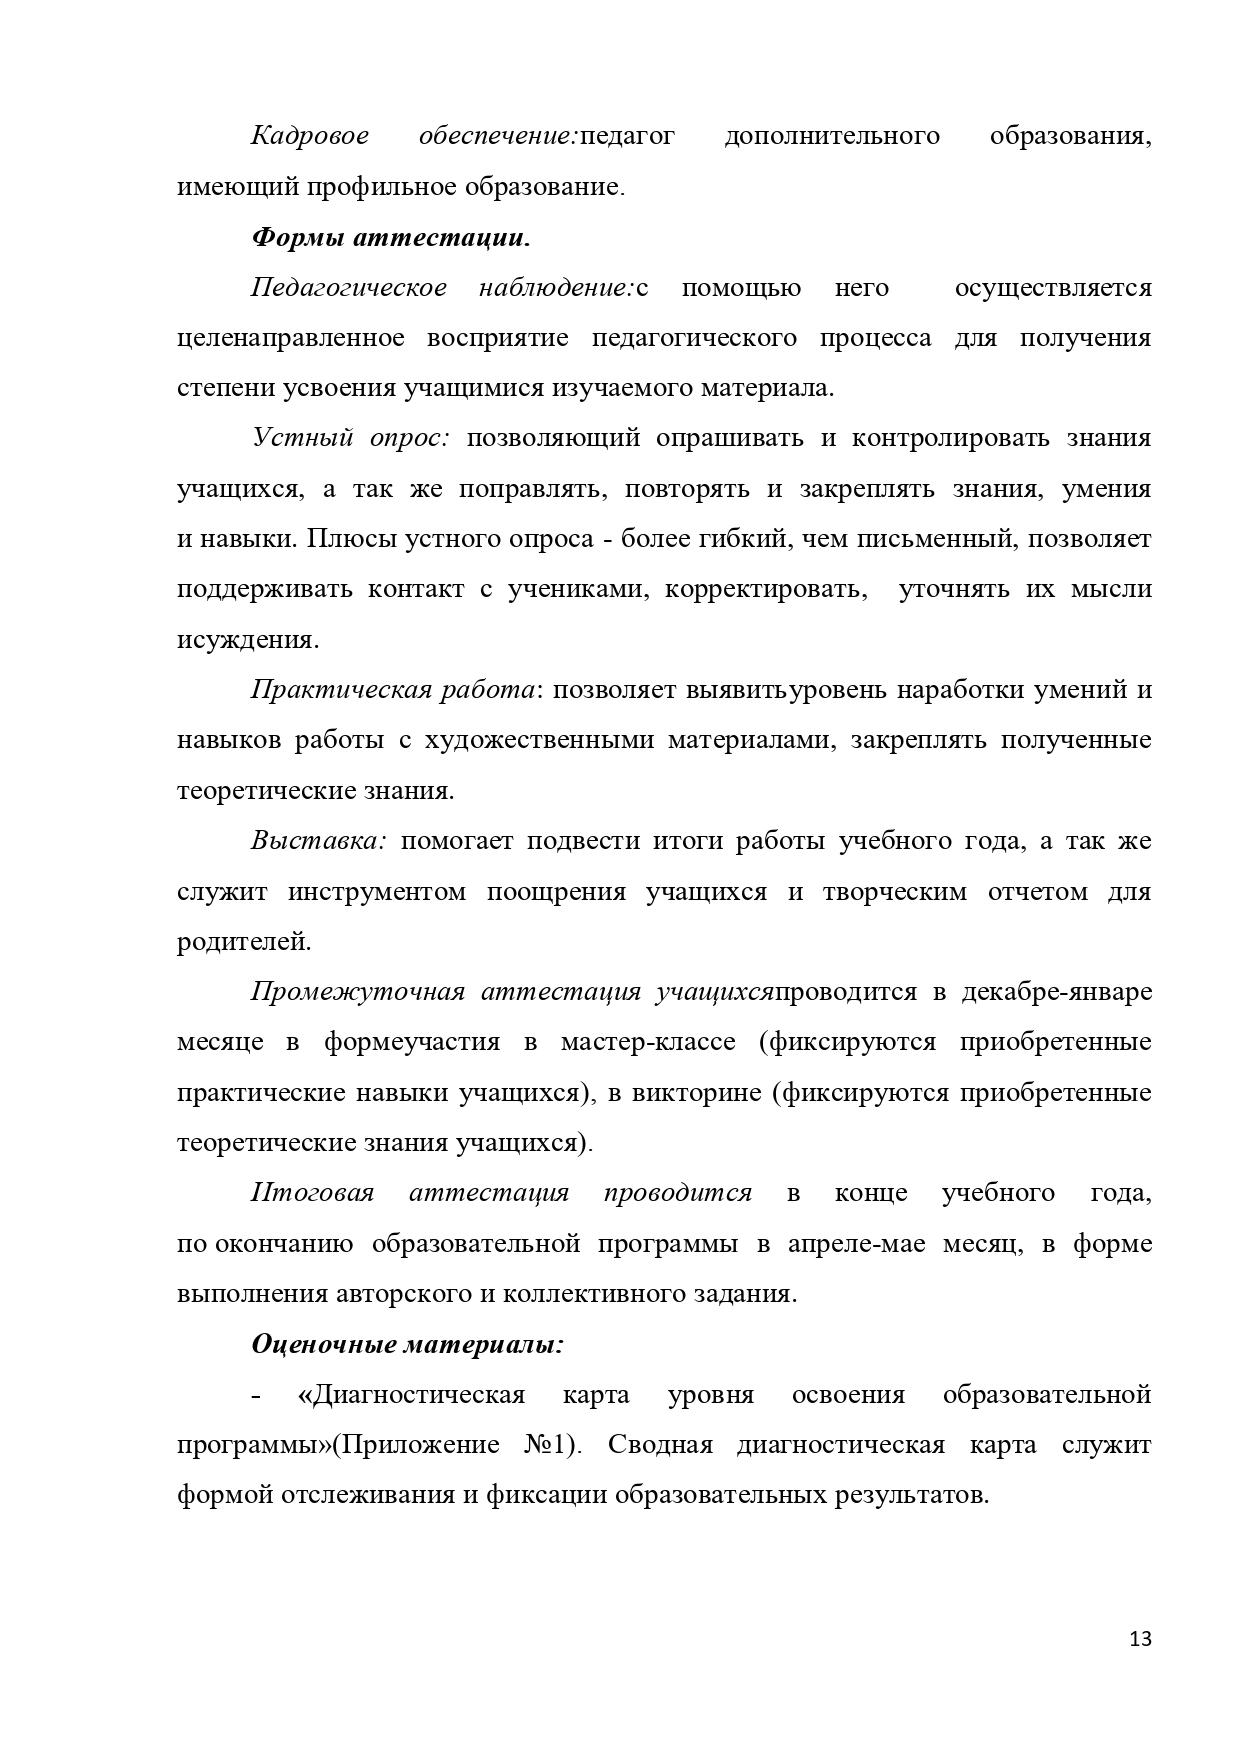 ДООП От познания к творчеству_pages-to-jpg-0013